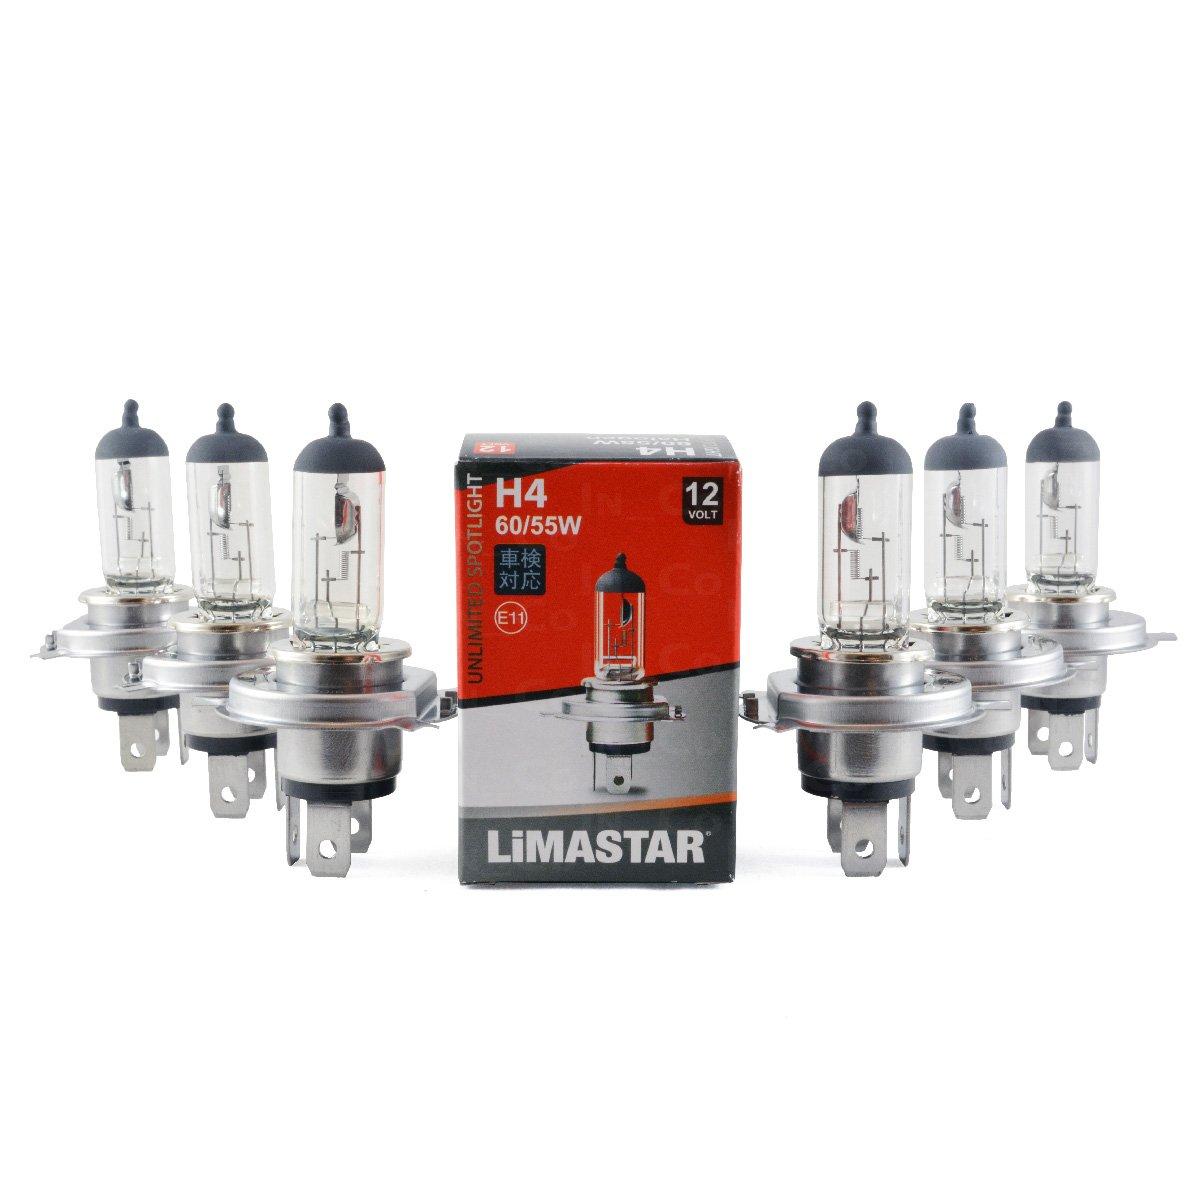 6x H460/55W 12V 60W/55W Bulb 43T Halogen Bulbs Incandescent Auto Clear White for Alfa Romeo 164(164) 33(907B)–75(162B), Alfetta (116), Spider (115)